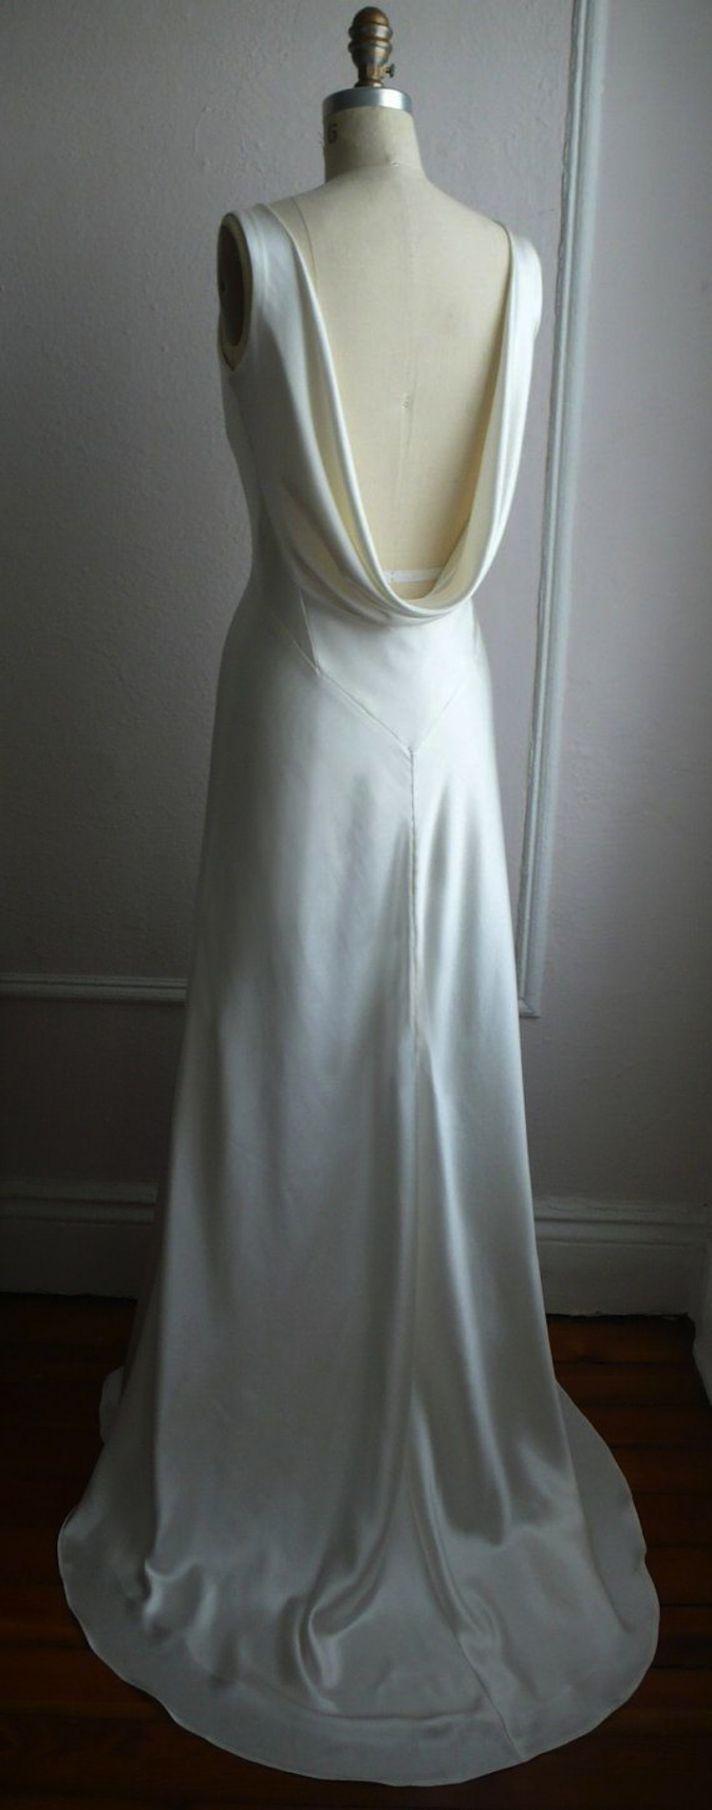 Sleek Wedding Gowns 49 Superb Old Time Silk Dress